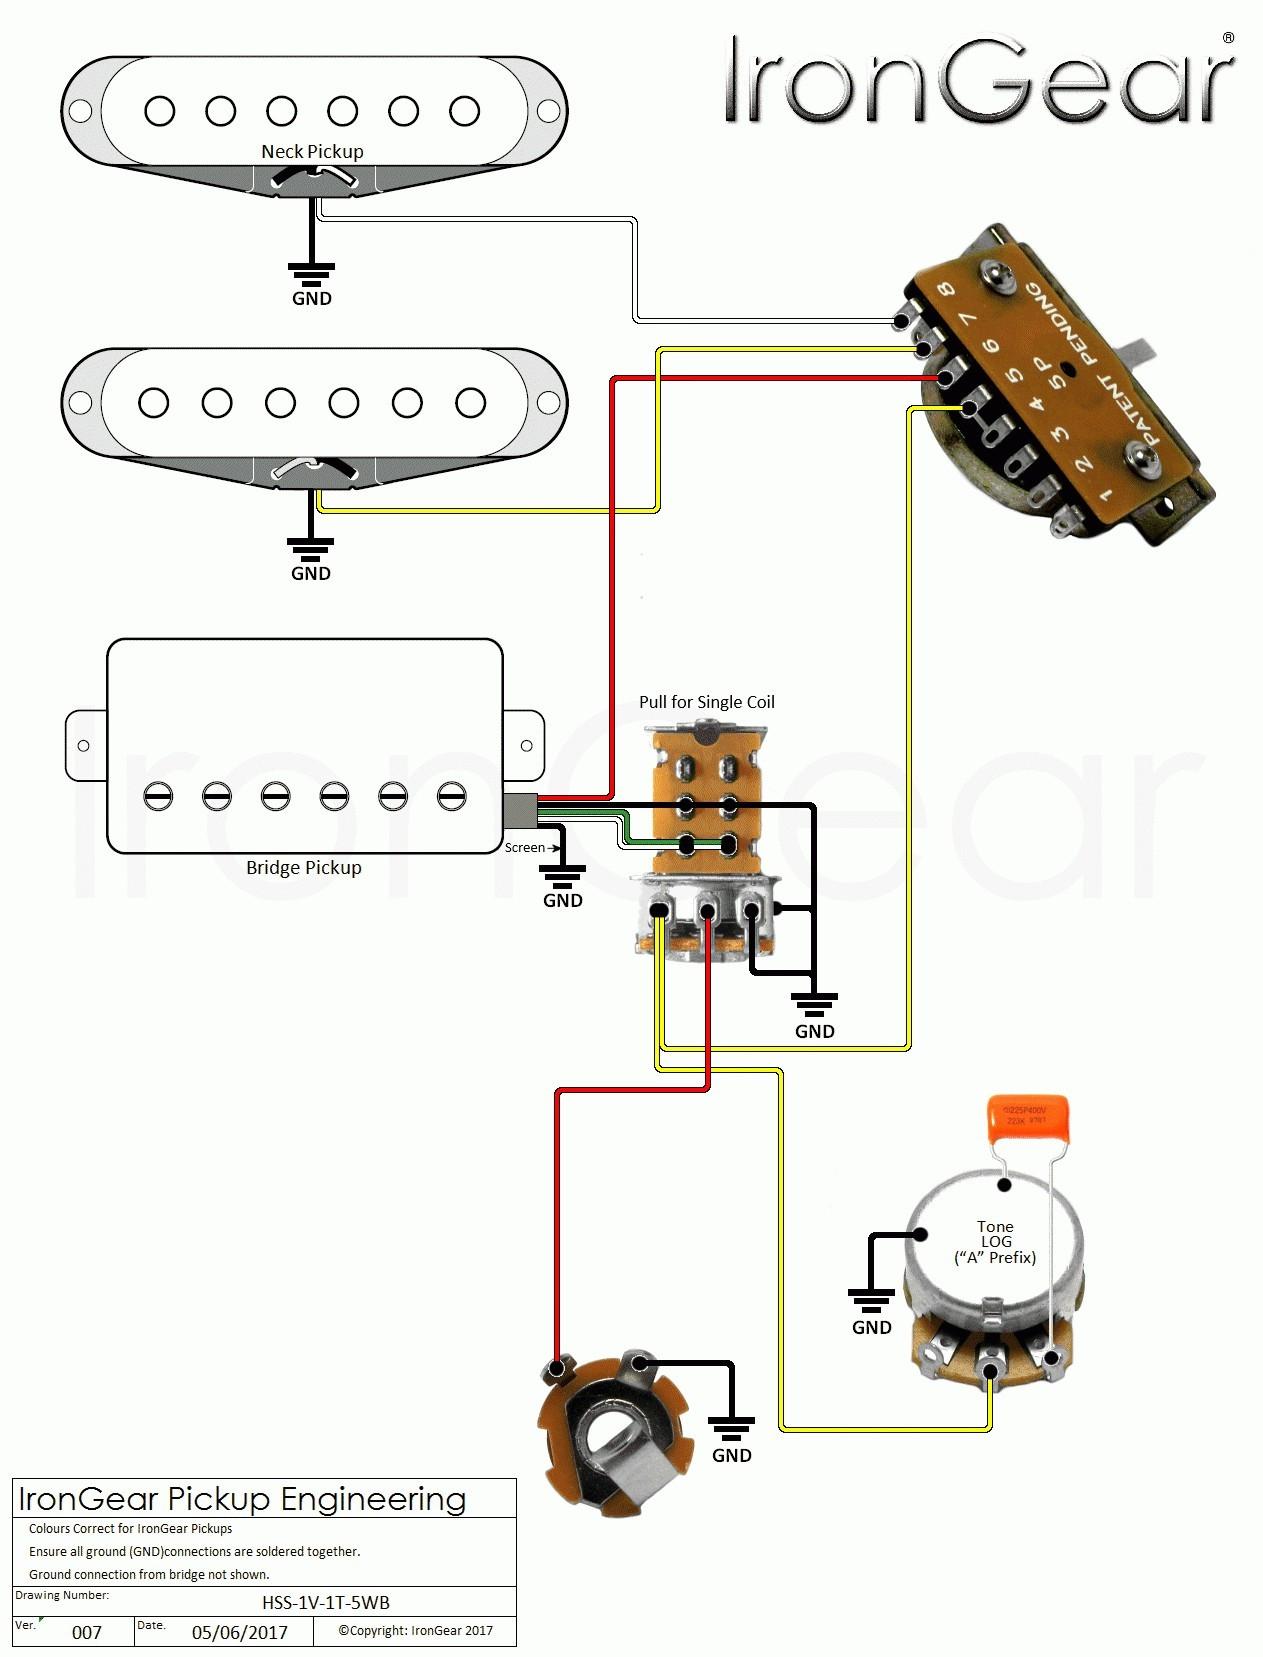 Electric Guitar Wiring Diagram e Pickup Fresh Guitar Wiring Diagrams 2 Pickups Guitar Wiring Diagram 2